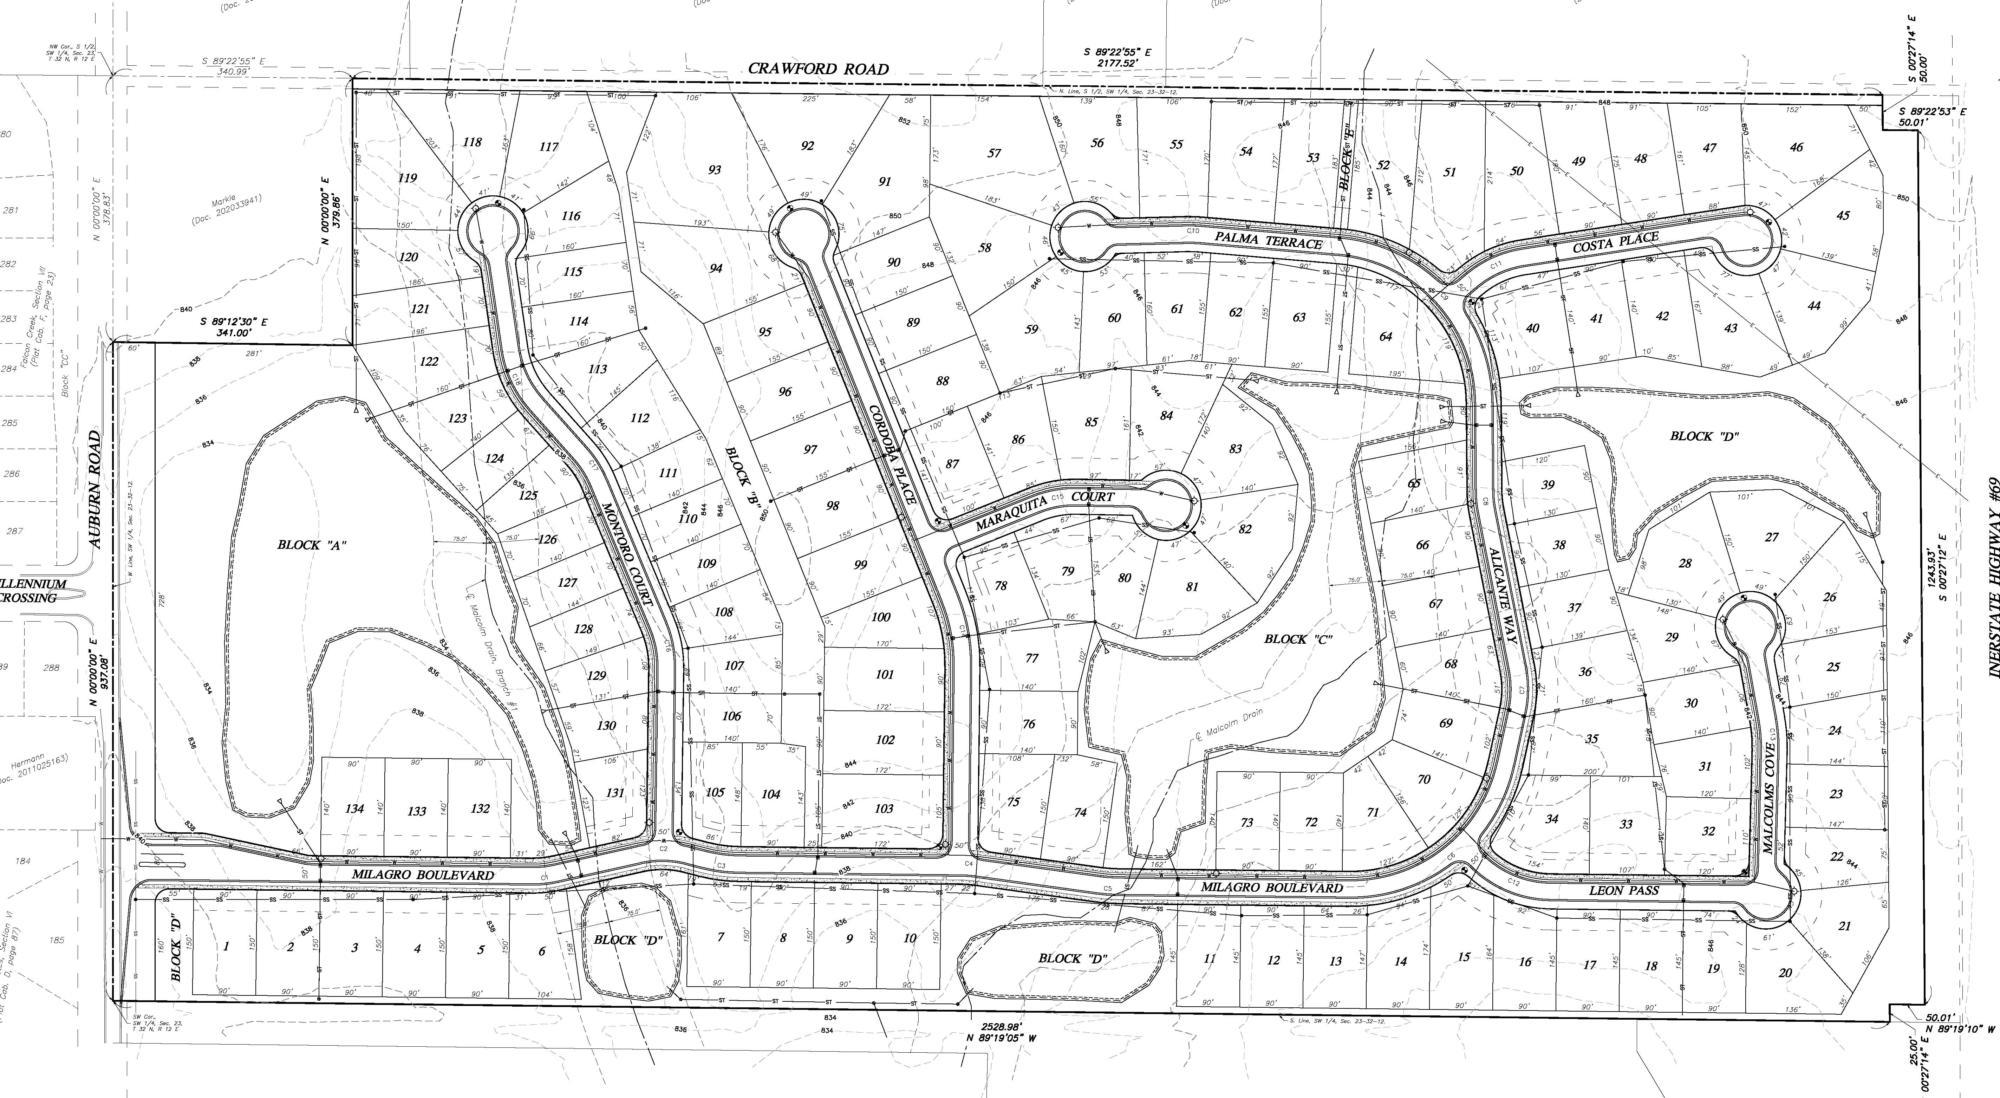 Milagro preliminary plans